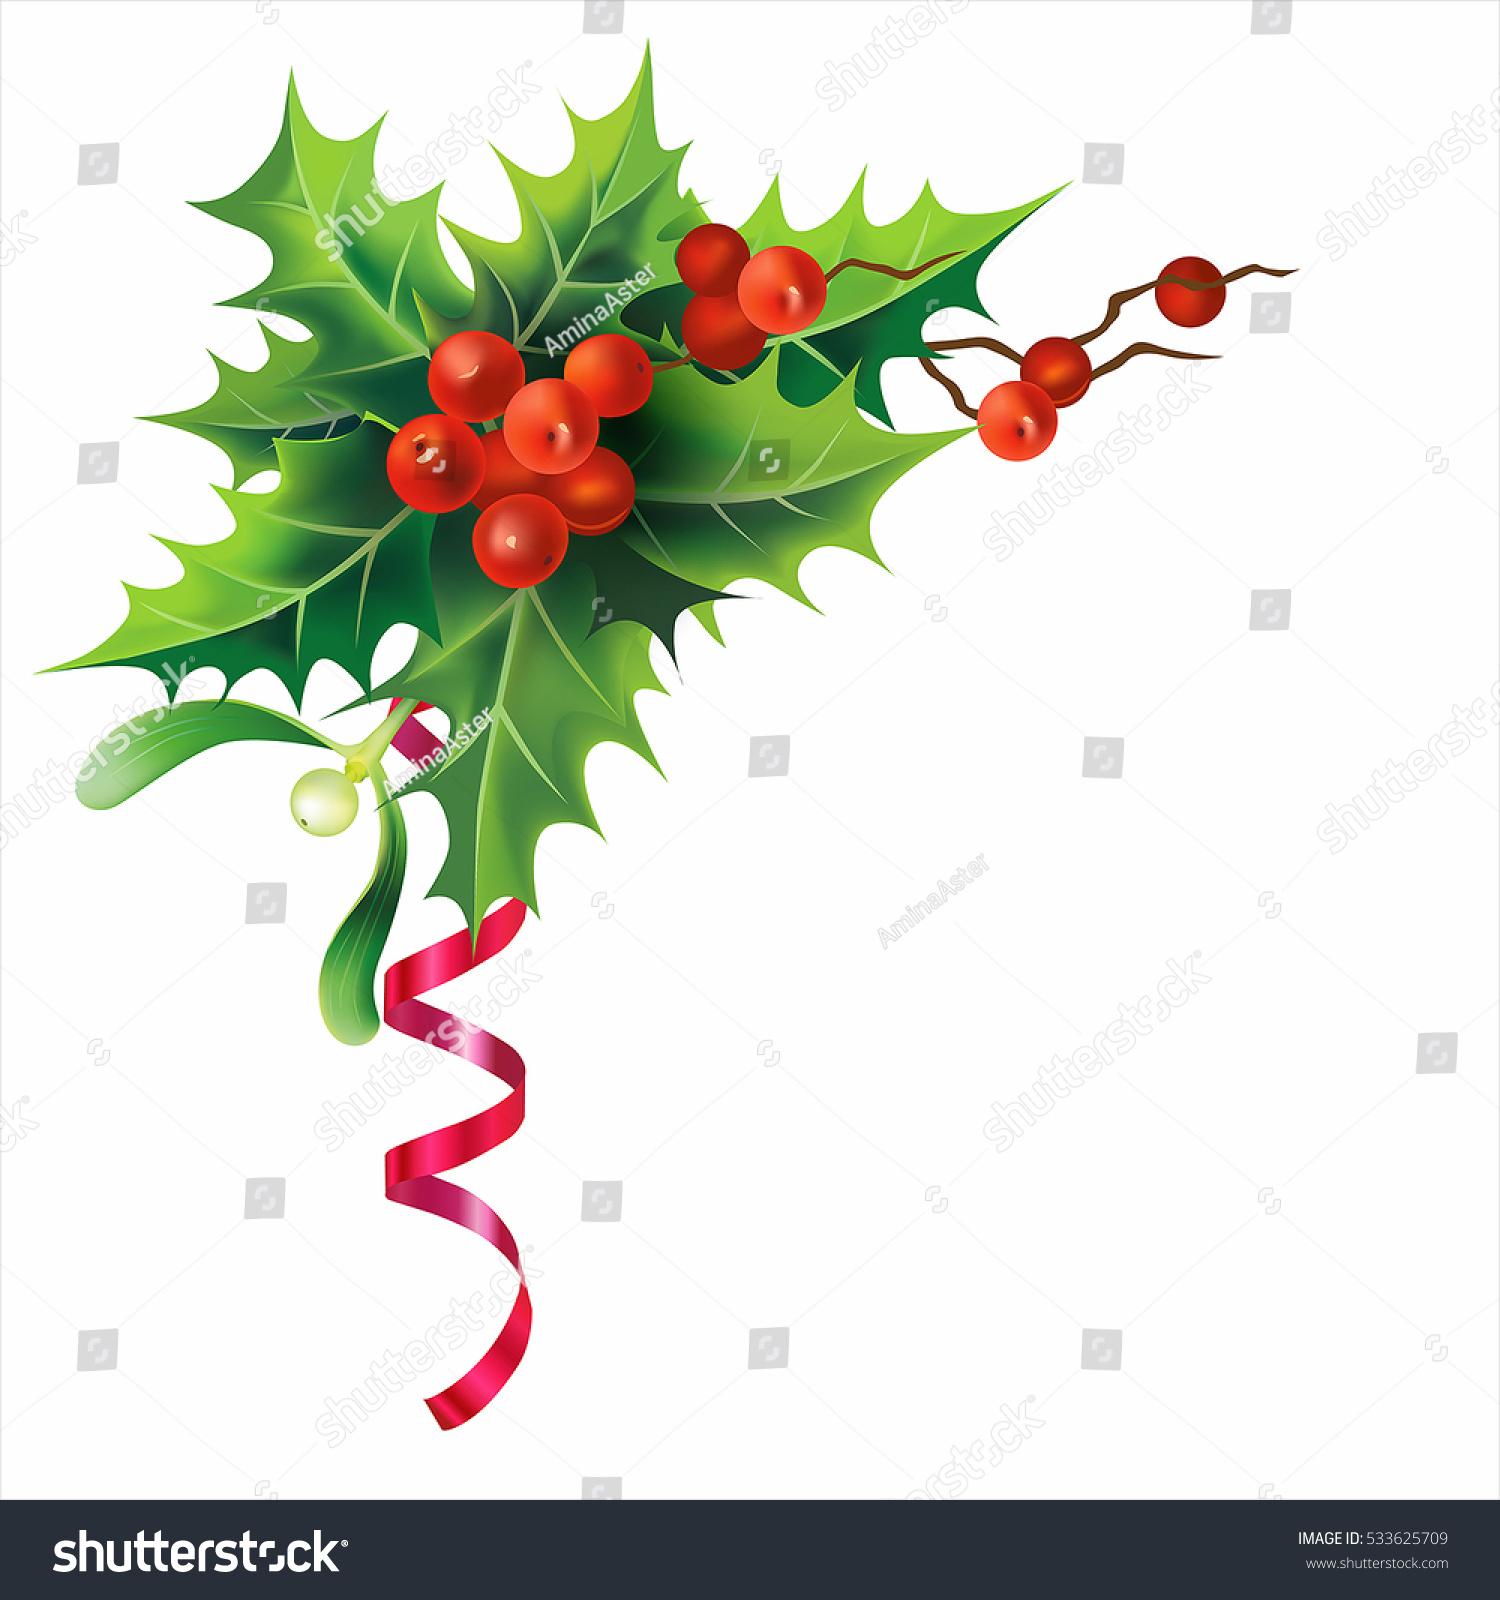 Christmas Holly Border Clipart.Christmas Holly Border Isolated On White Stock Vector